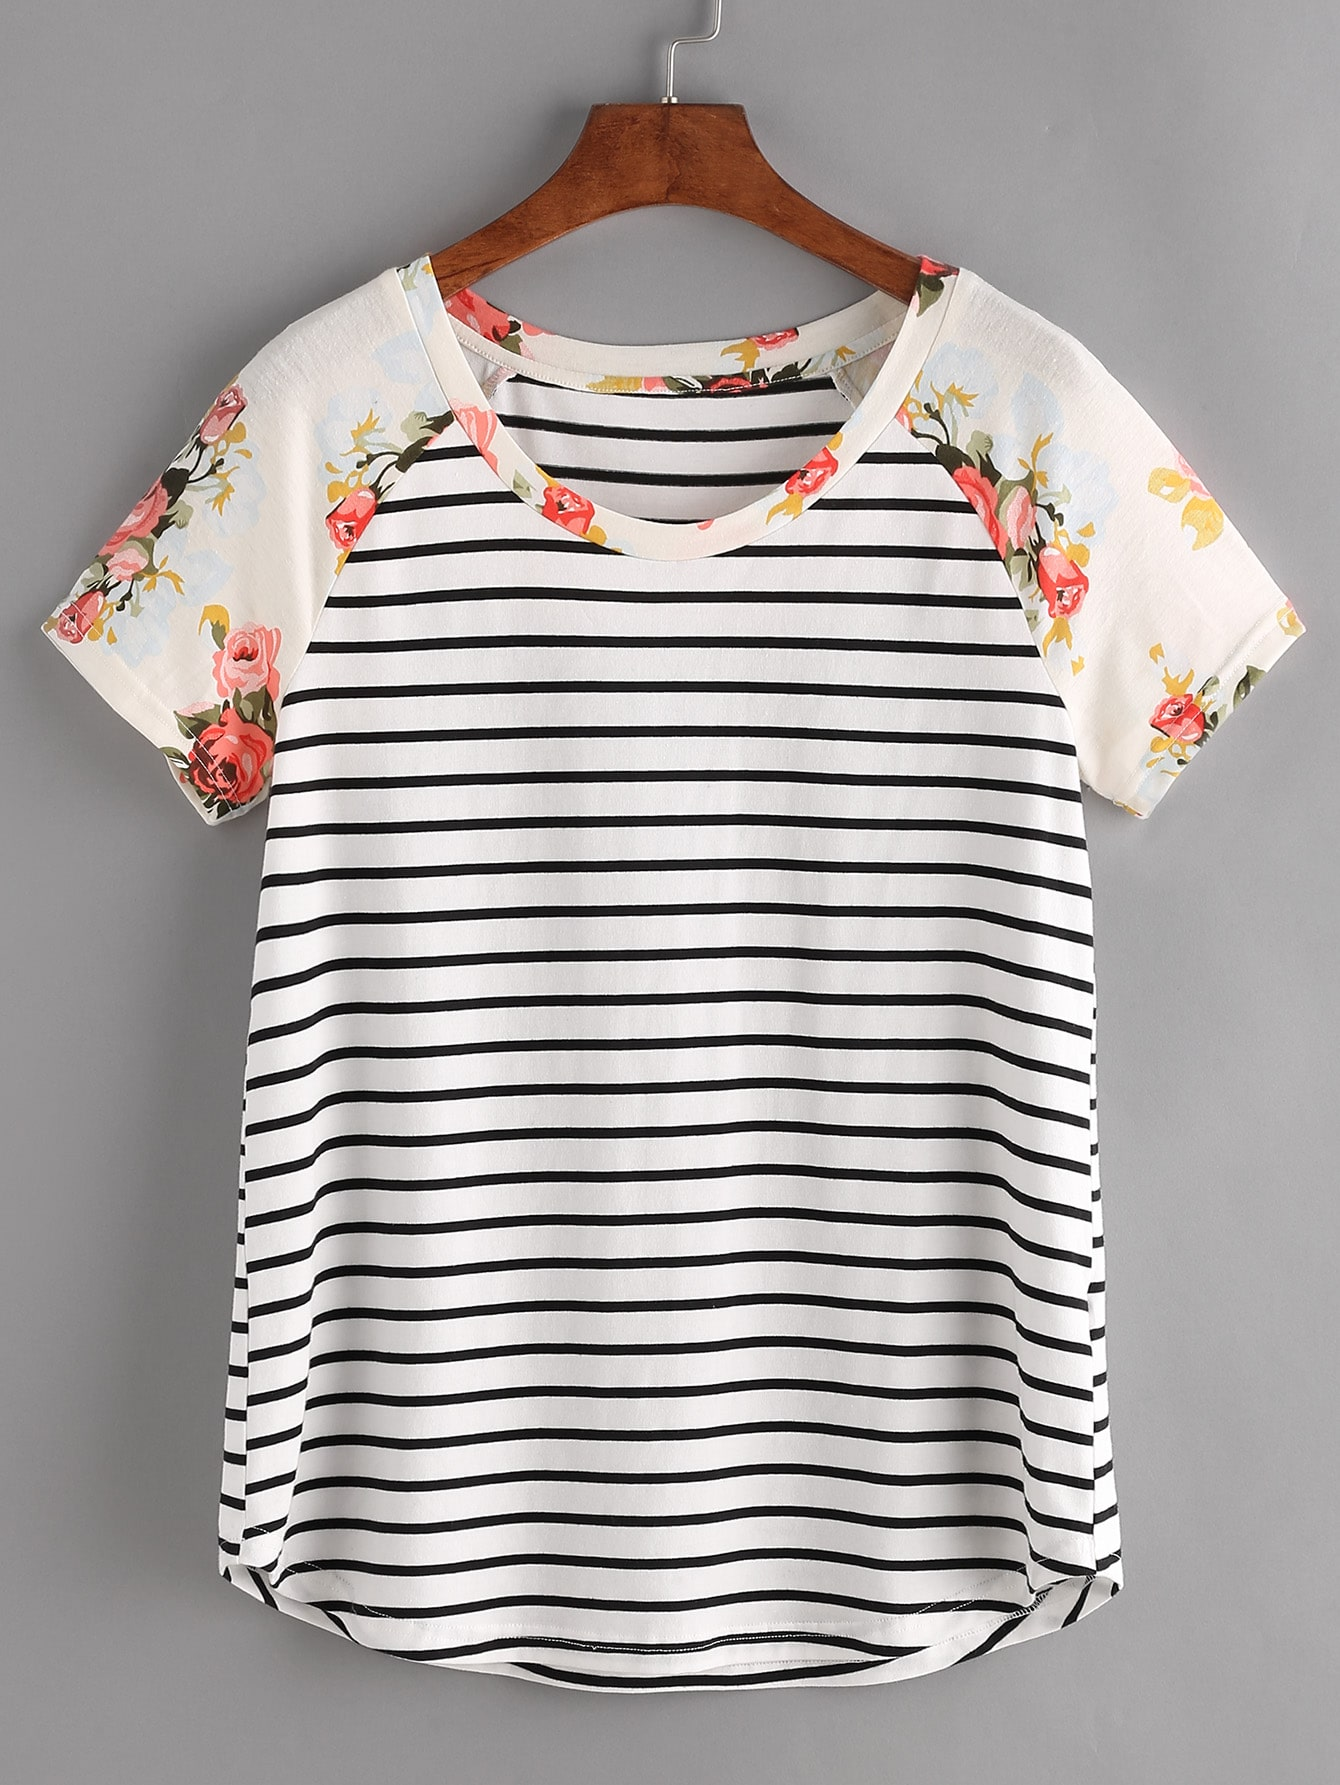 Floral Raglan Sleeve Striped Tee tee170320702